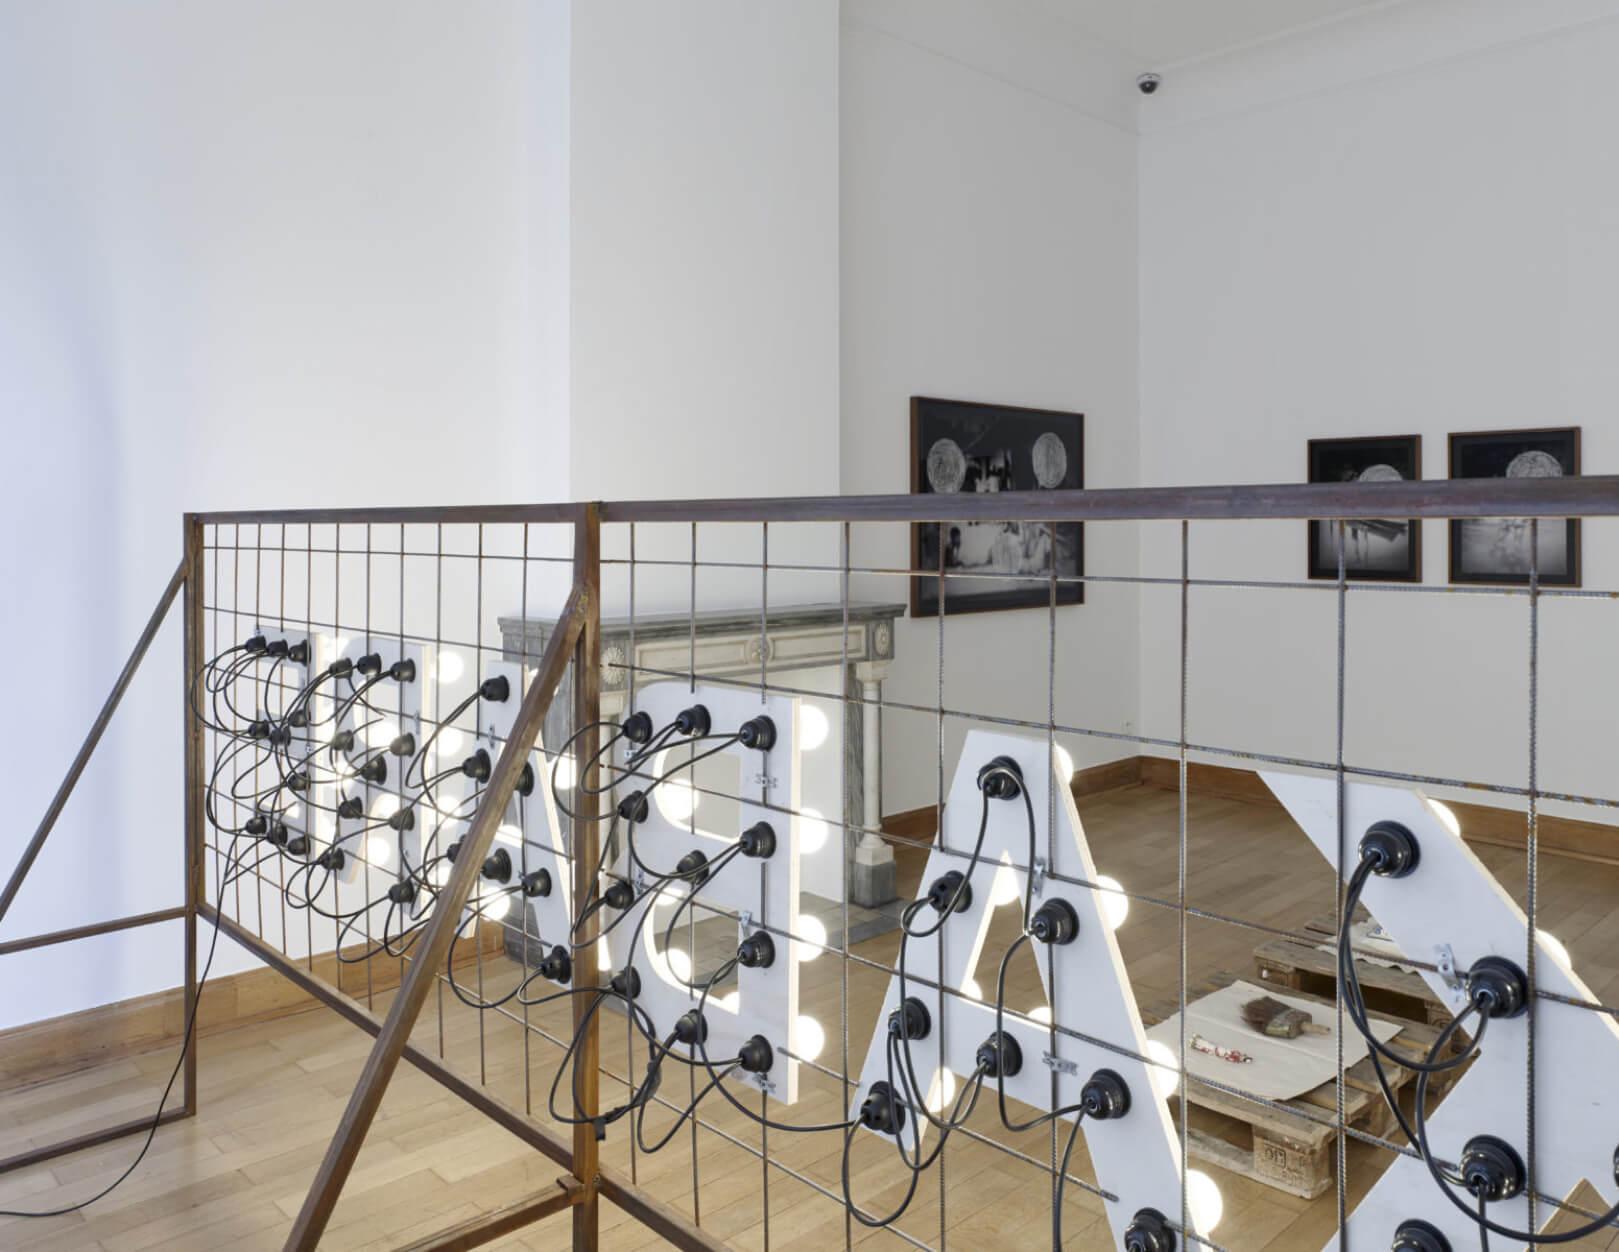 PauloNazareth-fineart-art-artcontemporain-exhibition-gallery-mendeswood-brussels-OKTO-_02